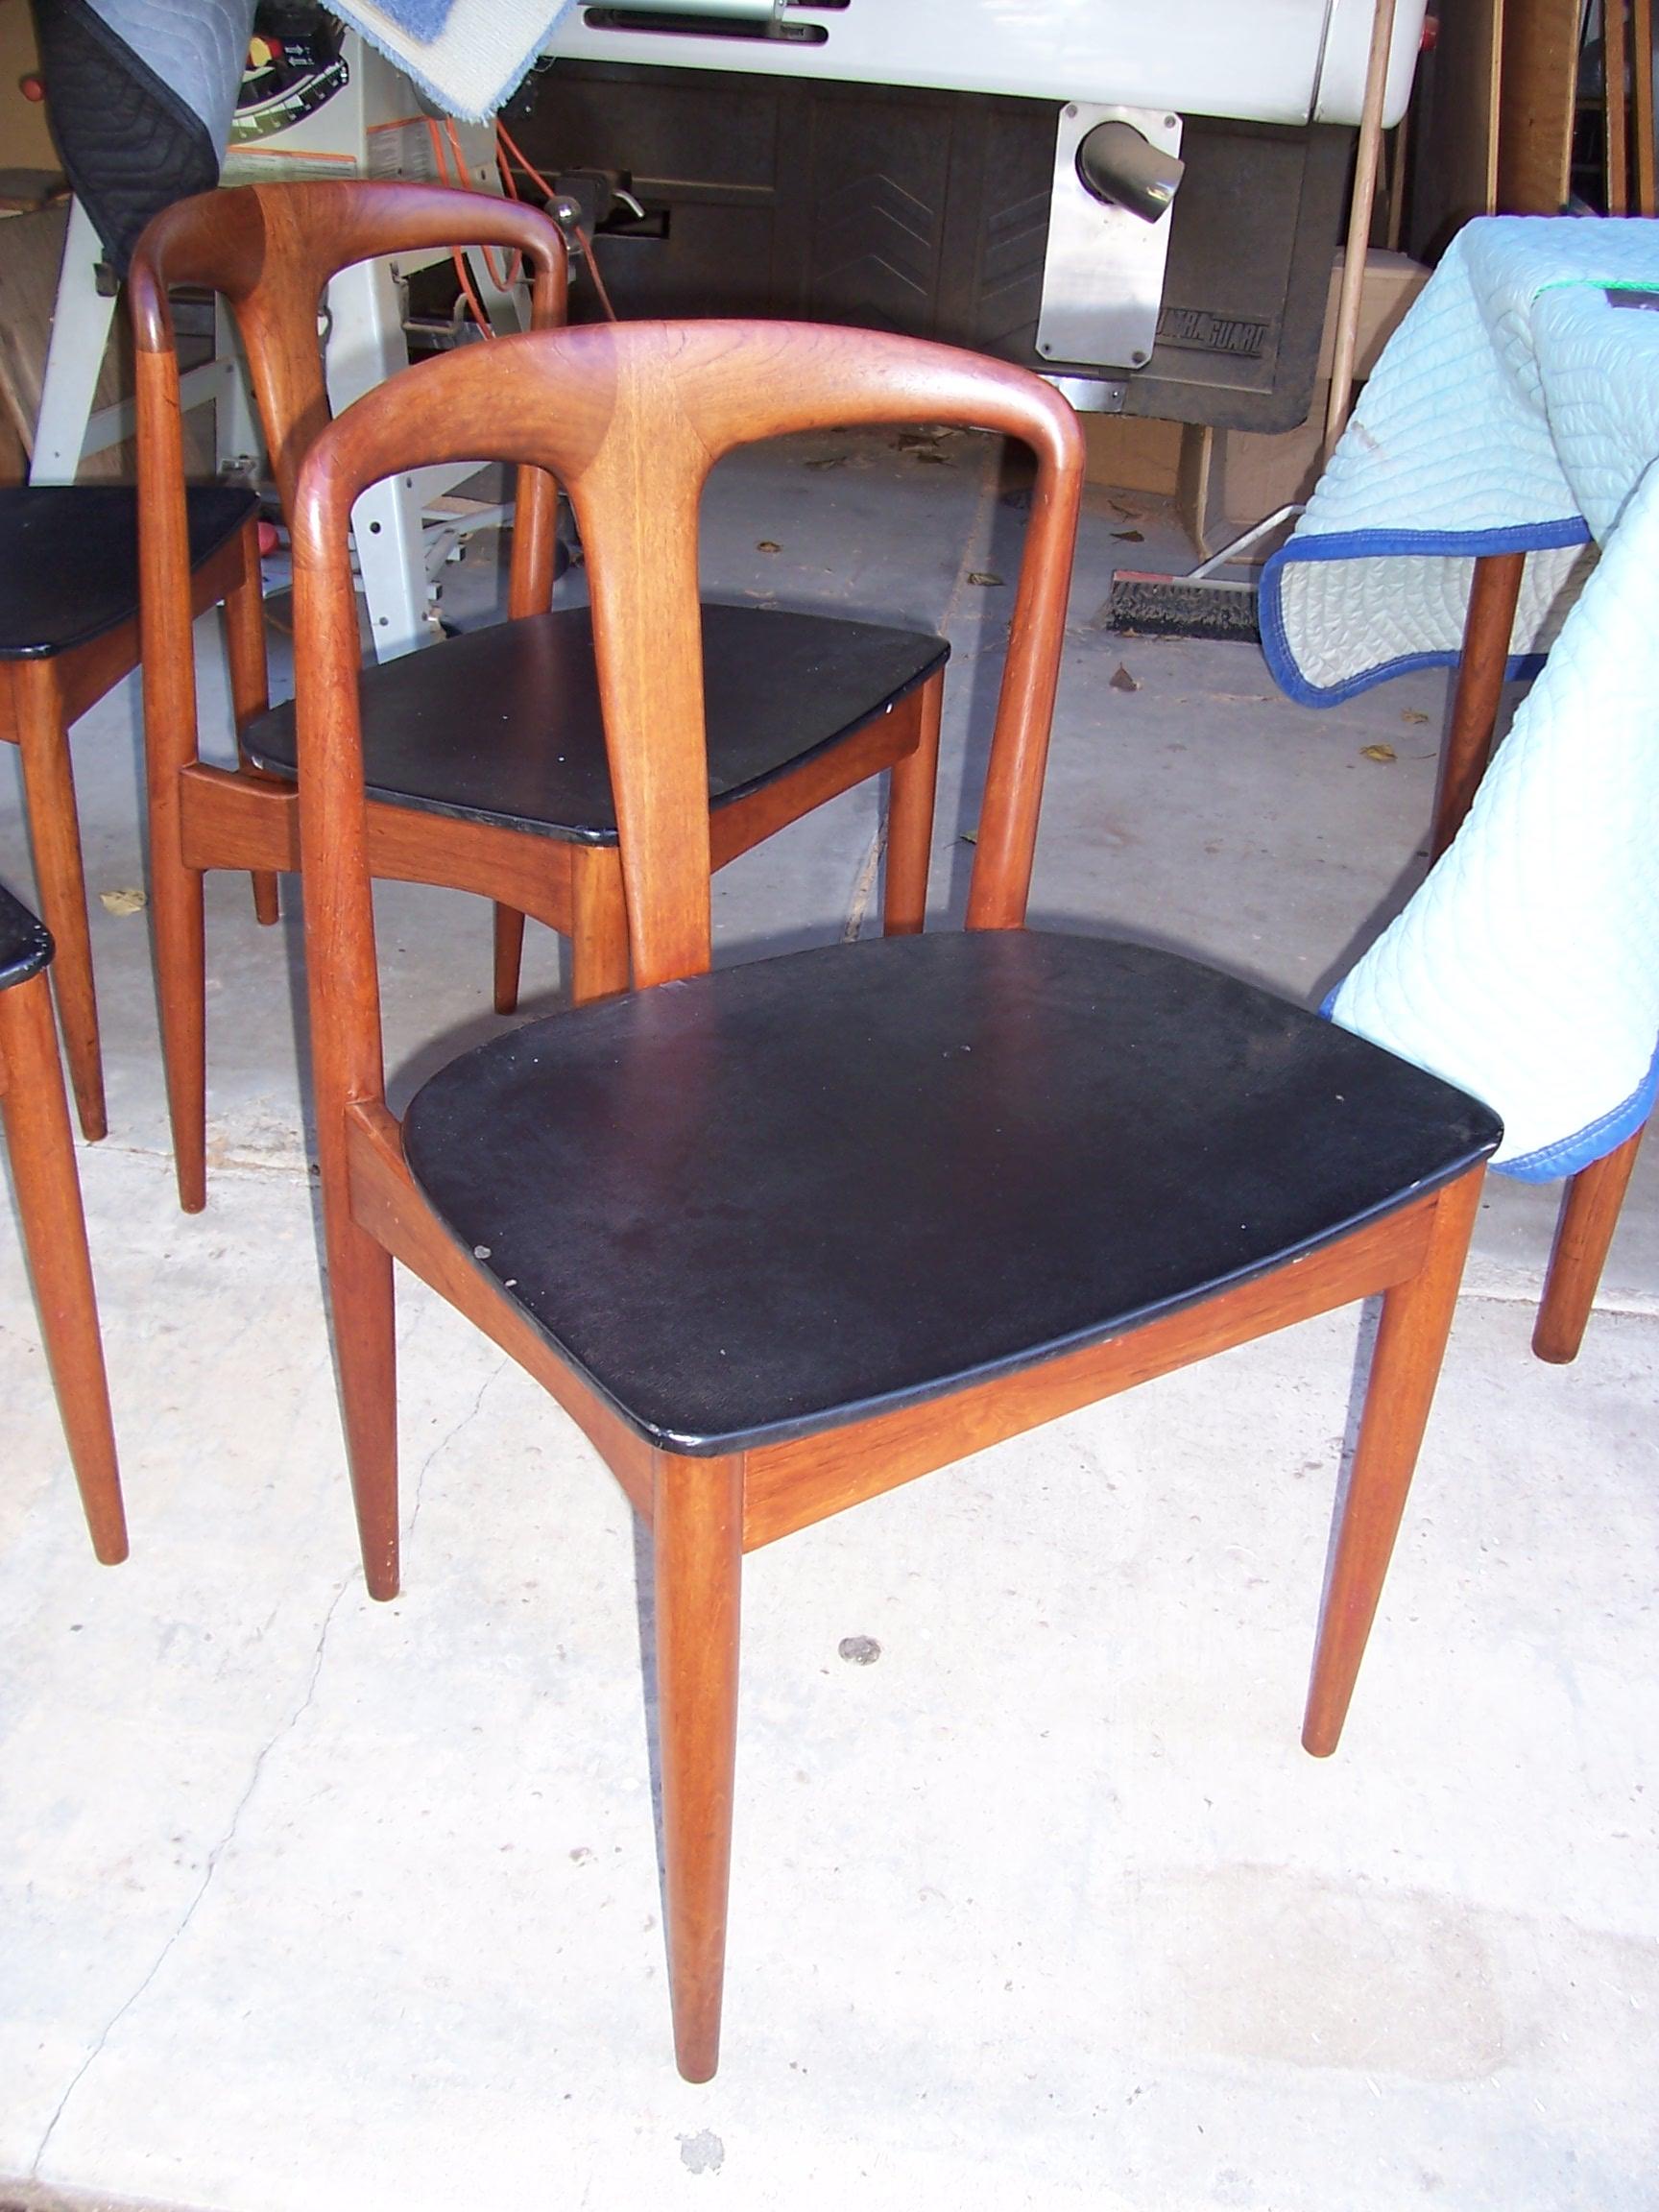 leather sofa repair orange county lazyboy furniture refinishing service